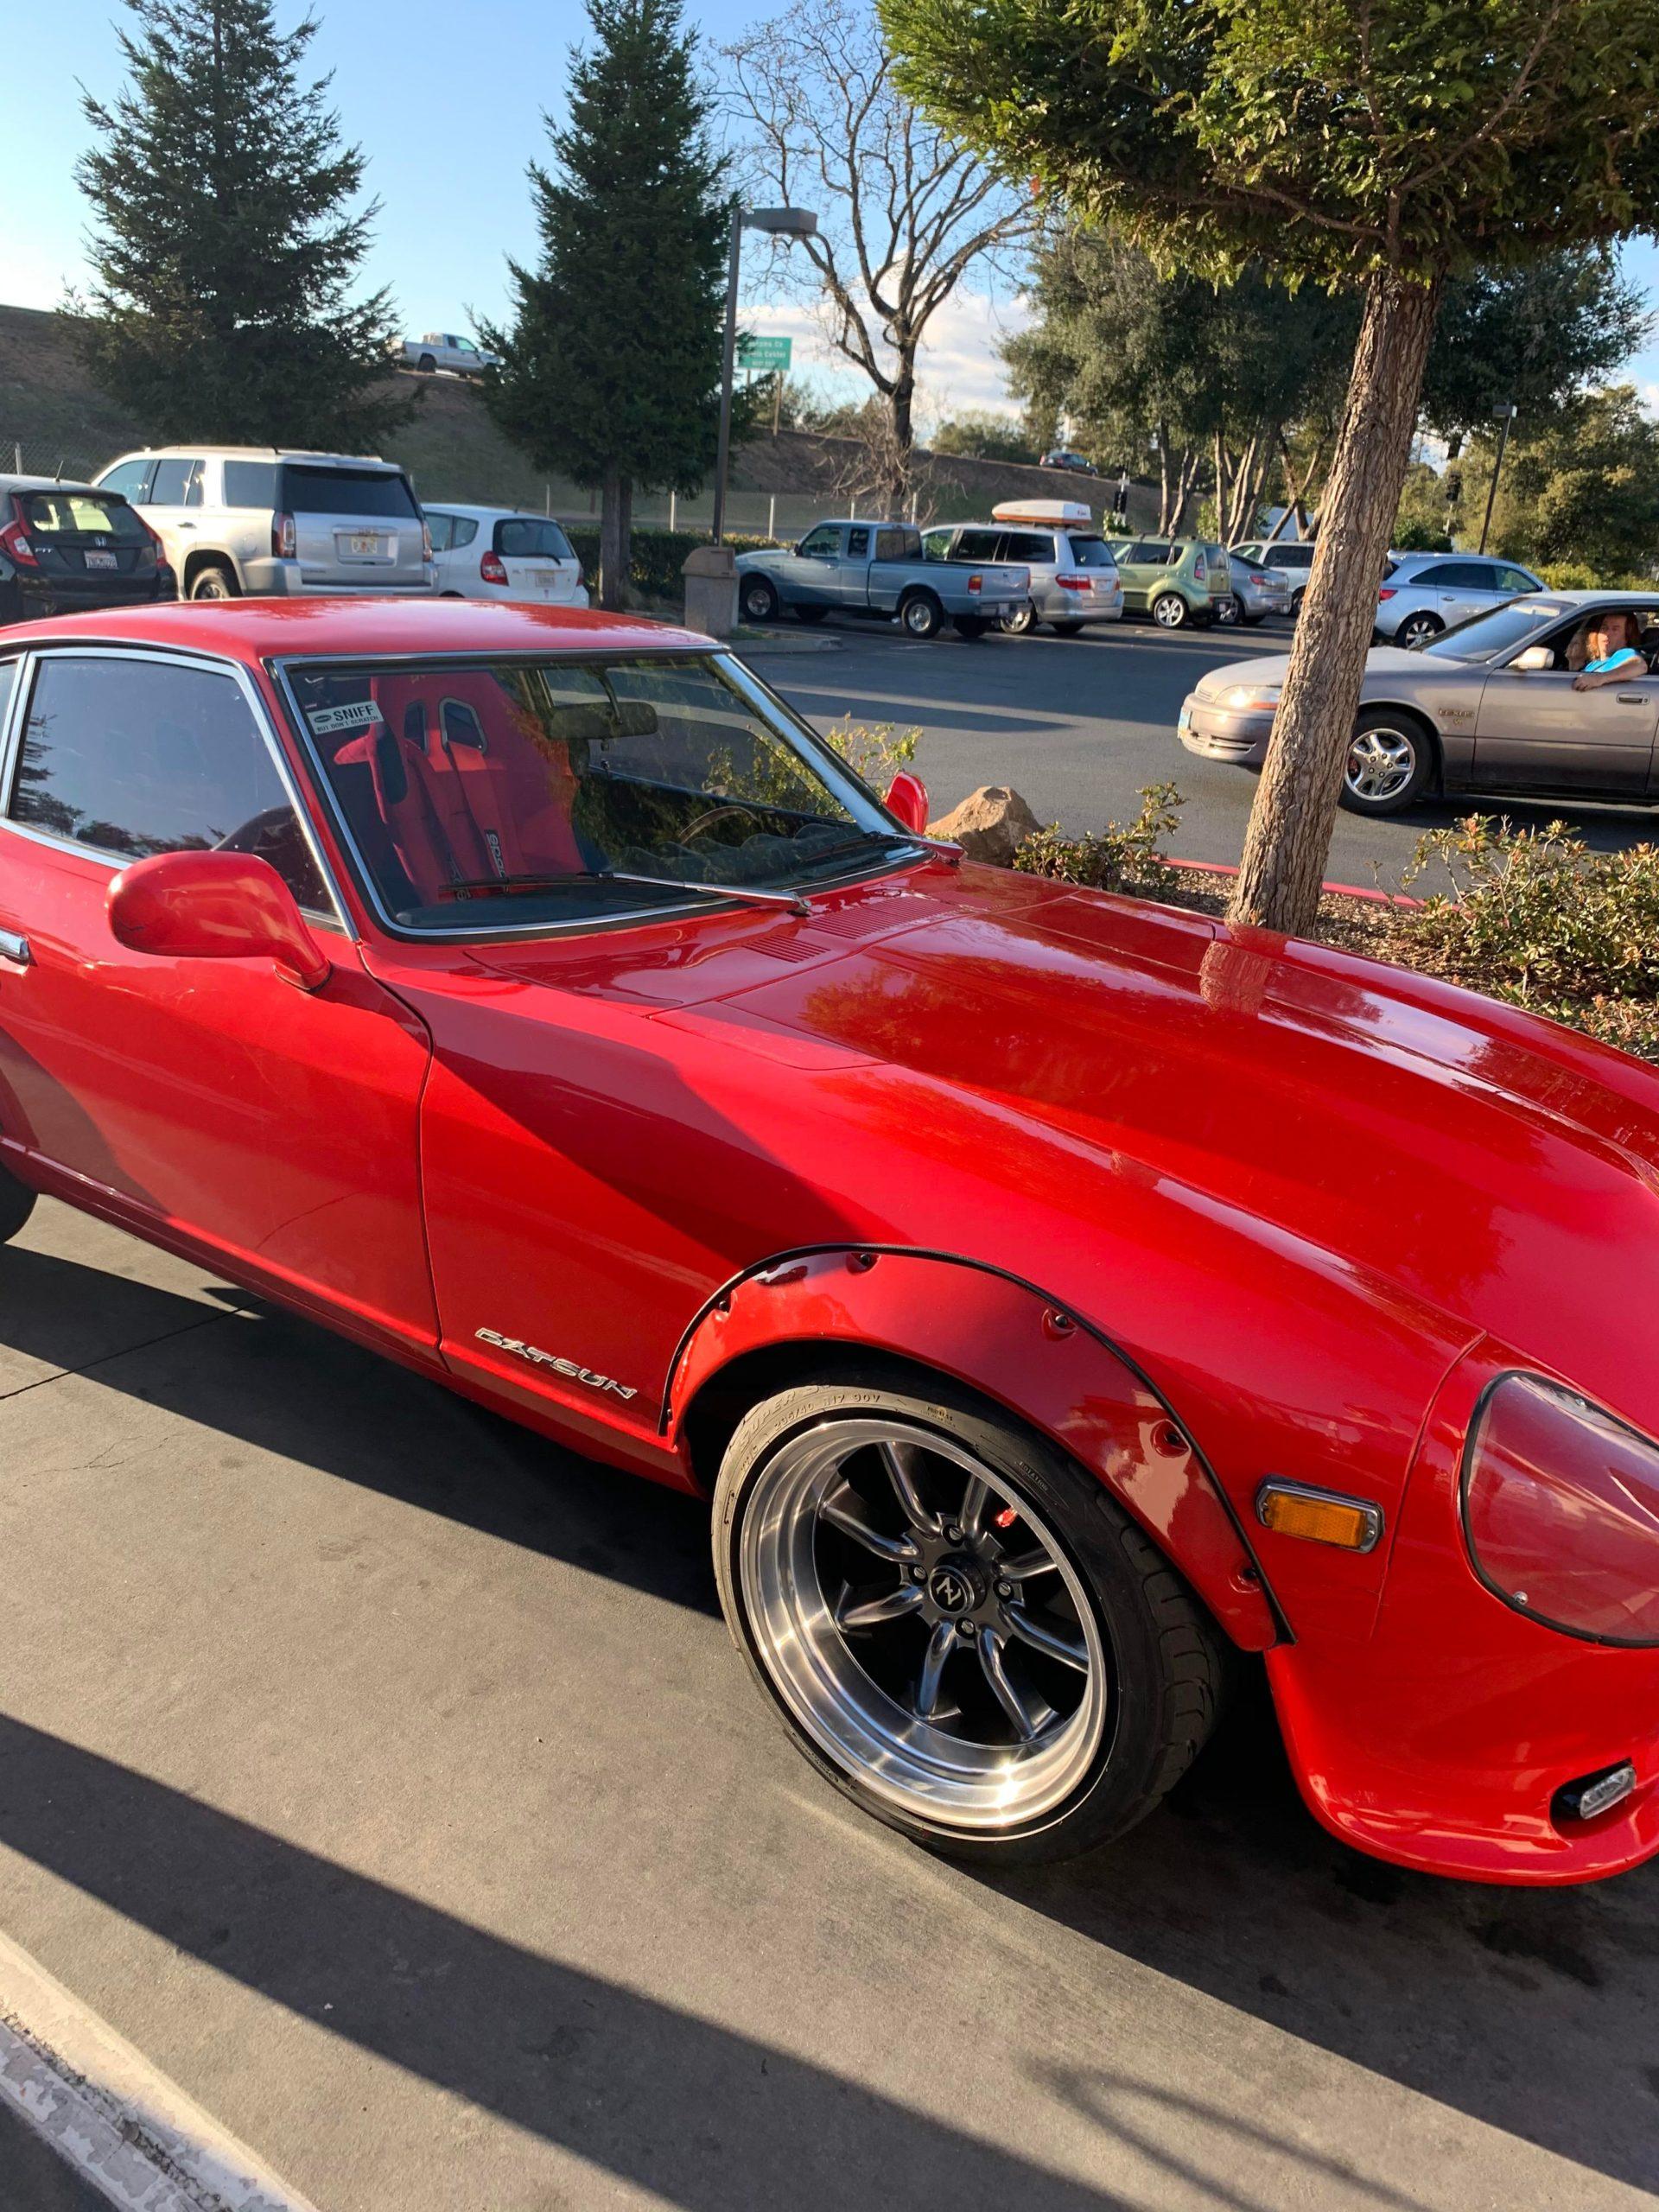 Cool Datsun build